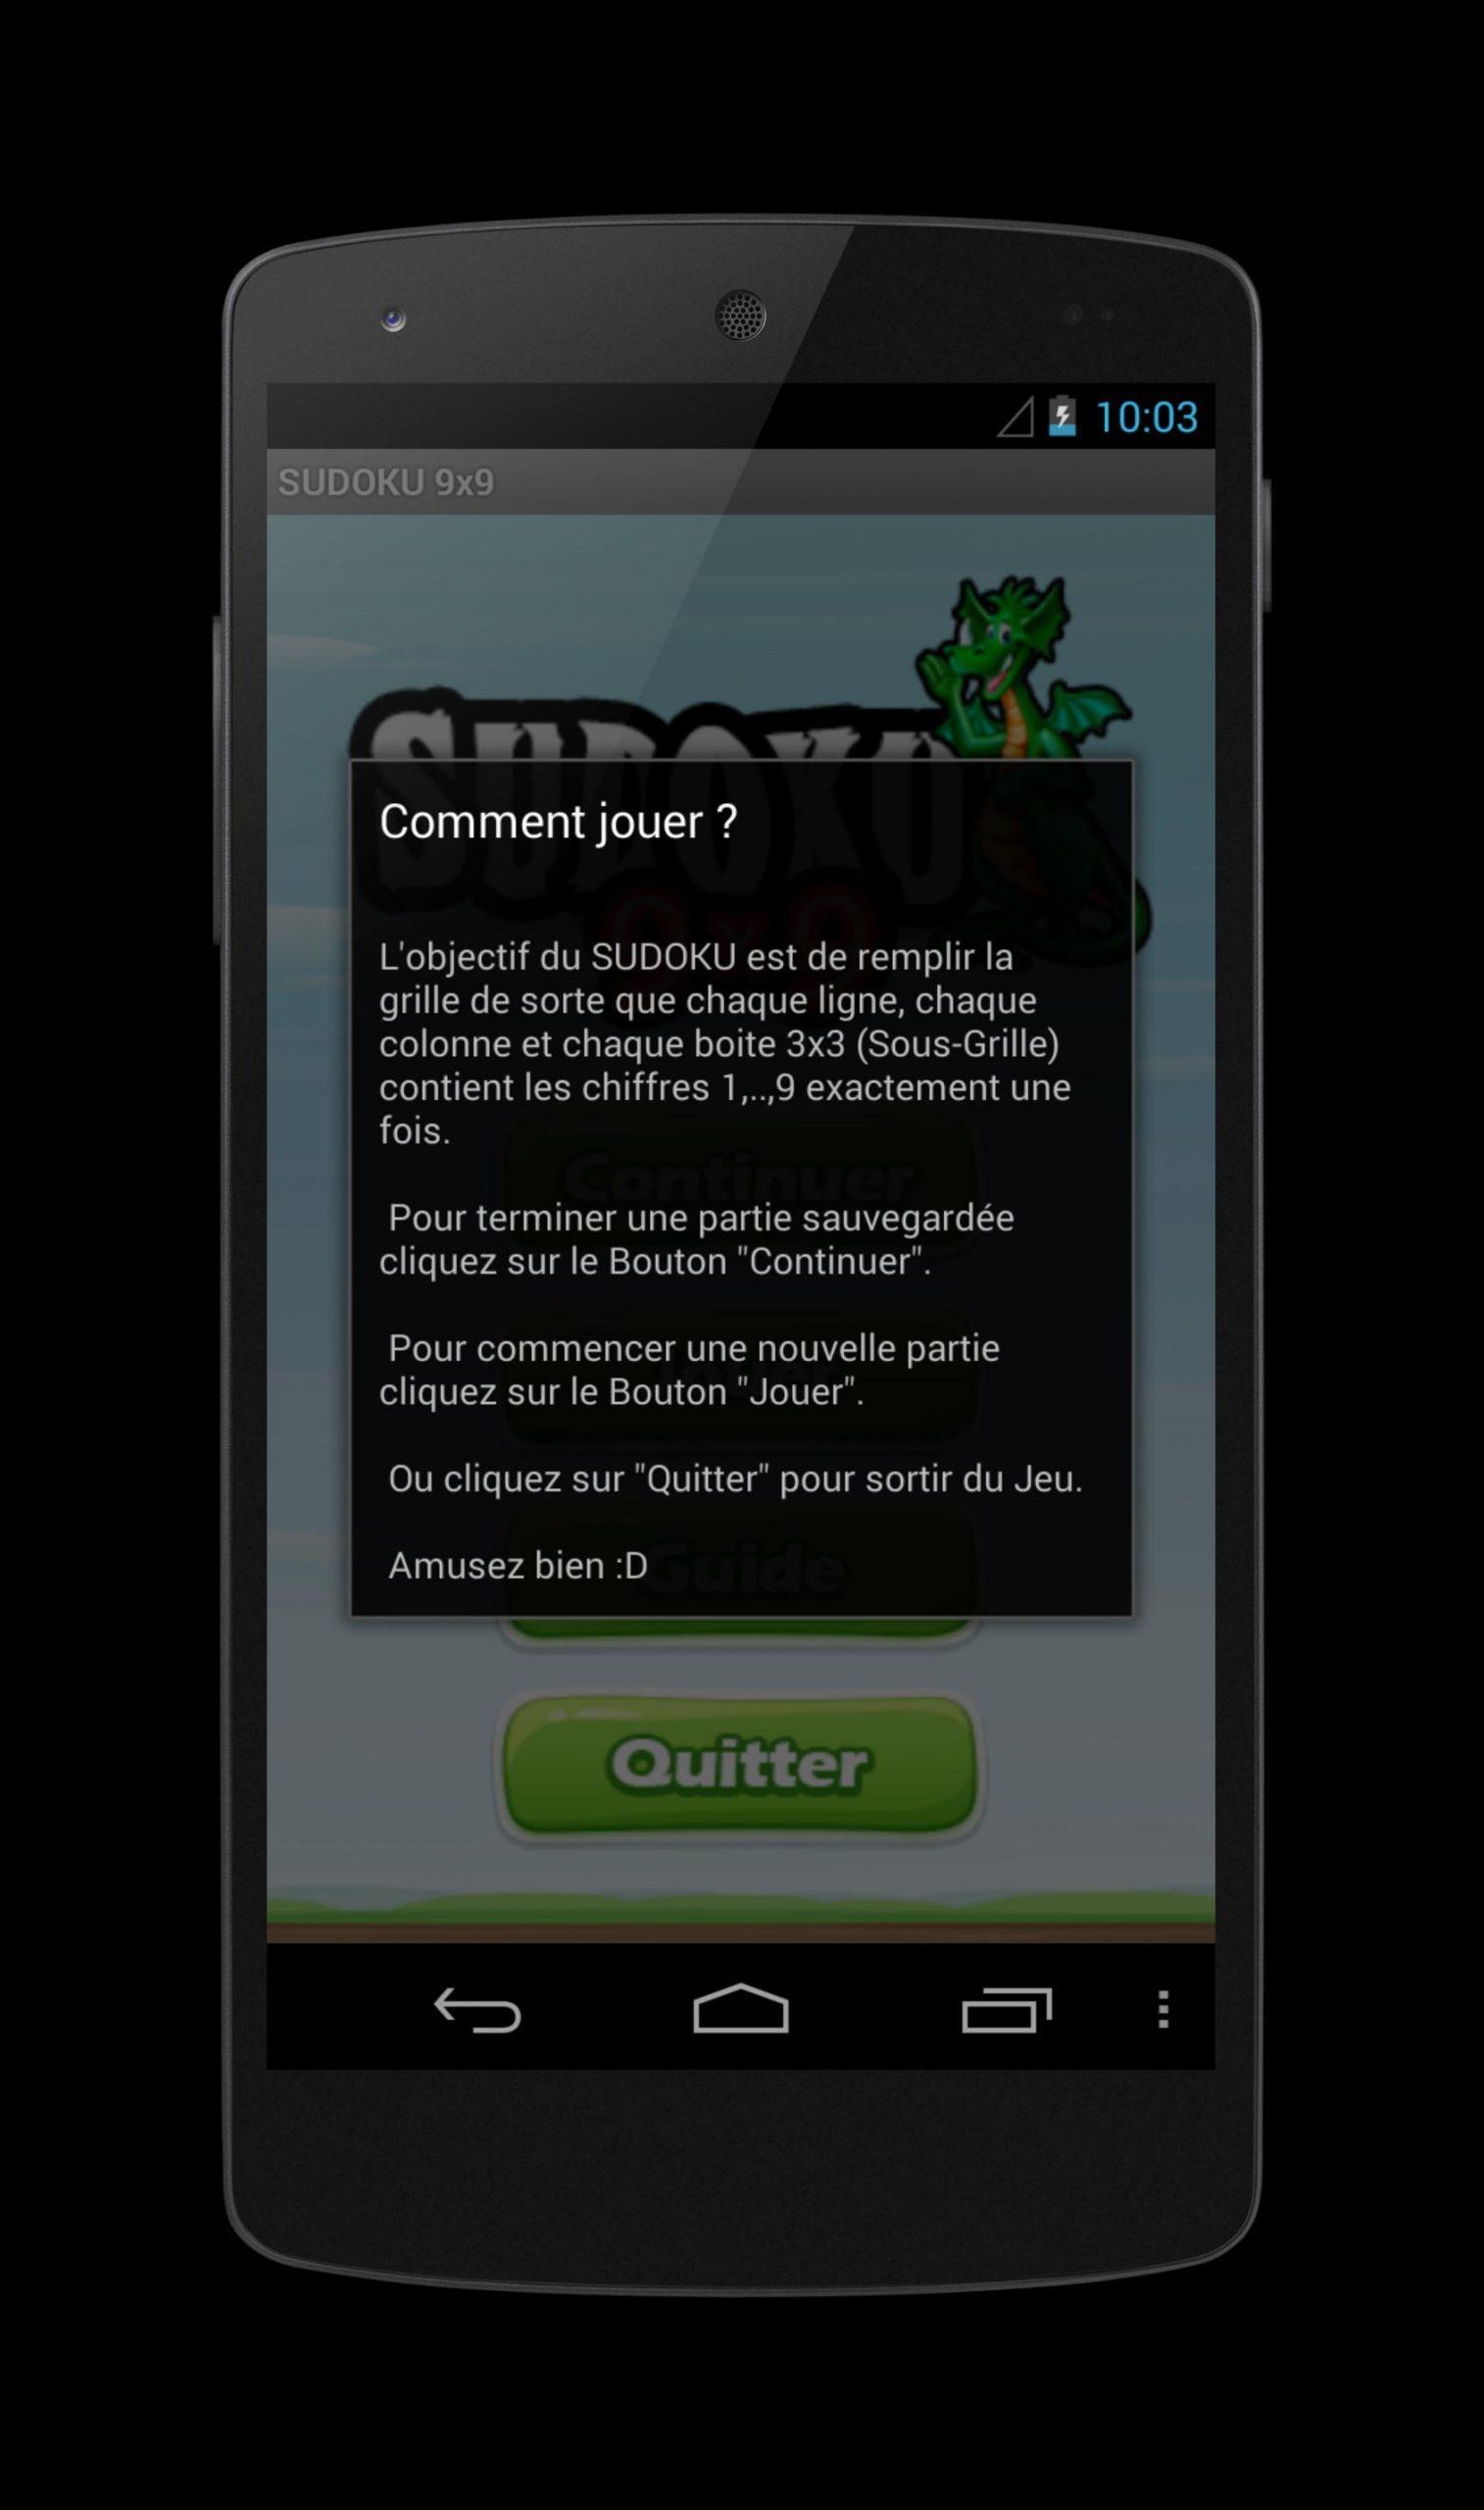 Android Için Sudoku 9X9 - Apk'yı İndir avec Sudoku Facile Avec Solution